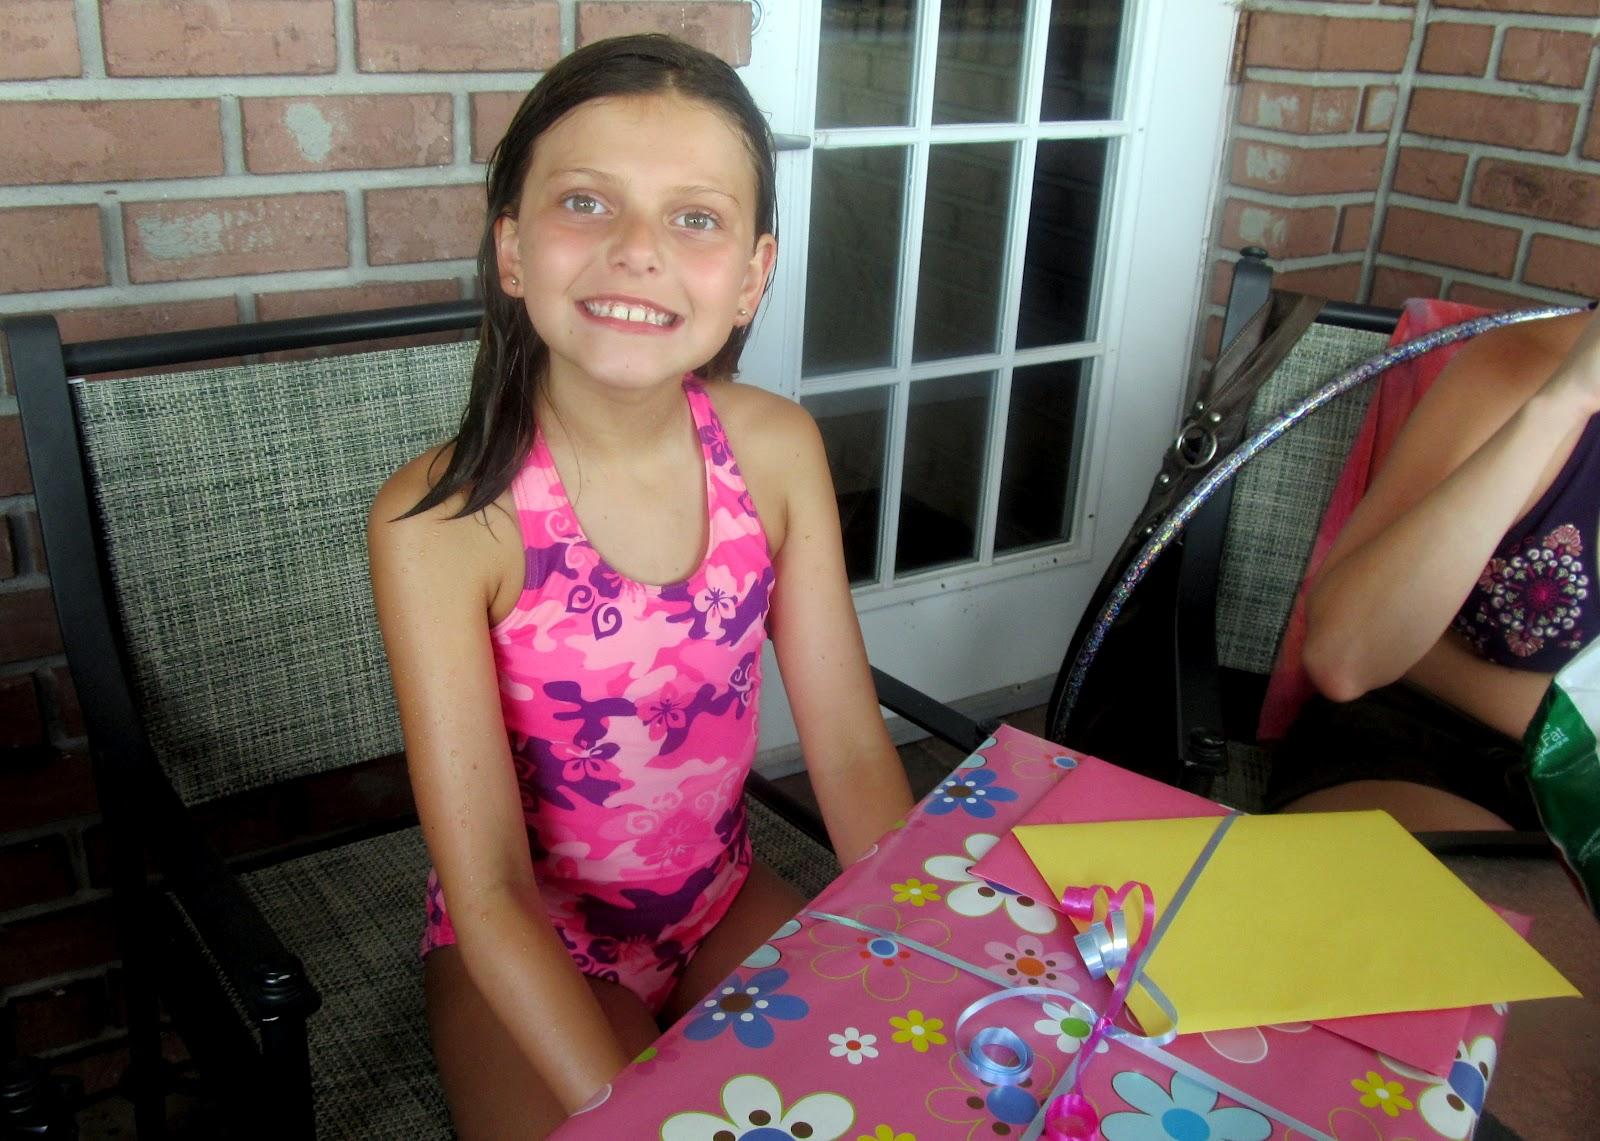 Girls 9th Birthday Cake Ideas and